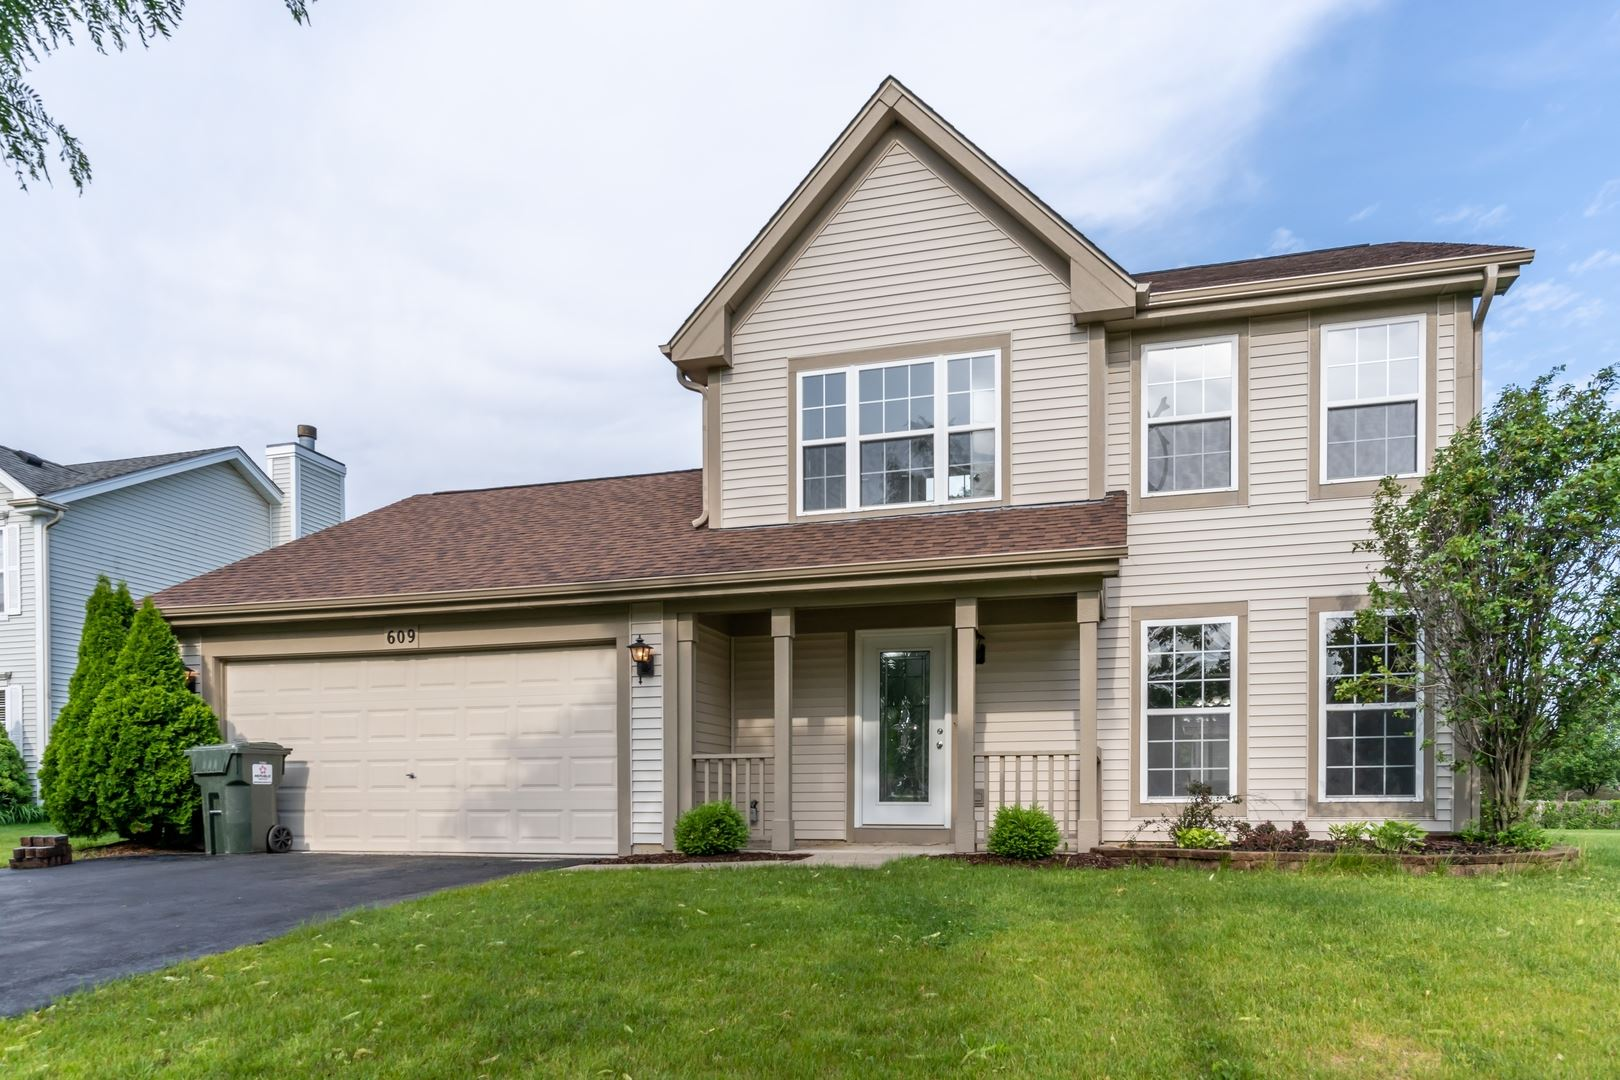 609 Maple Drive, Streamwood, IL 60107 - #: 10751015